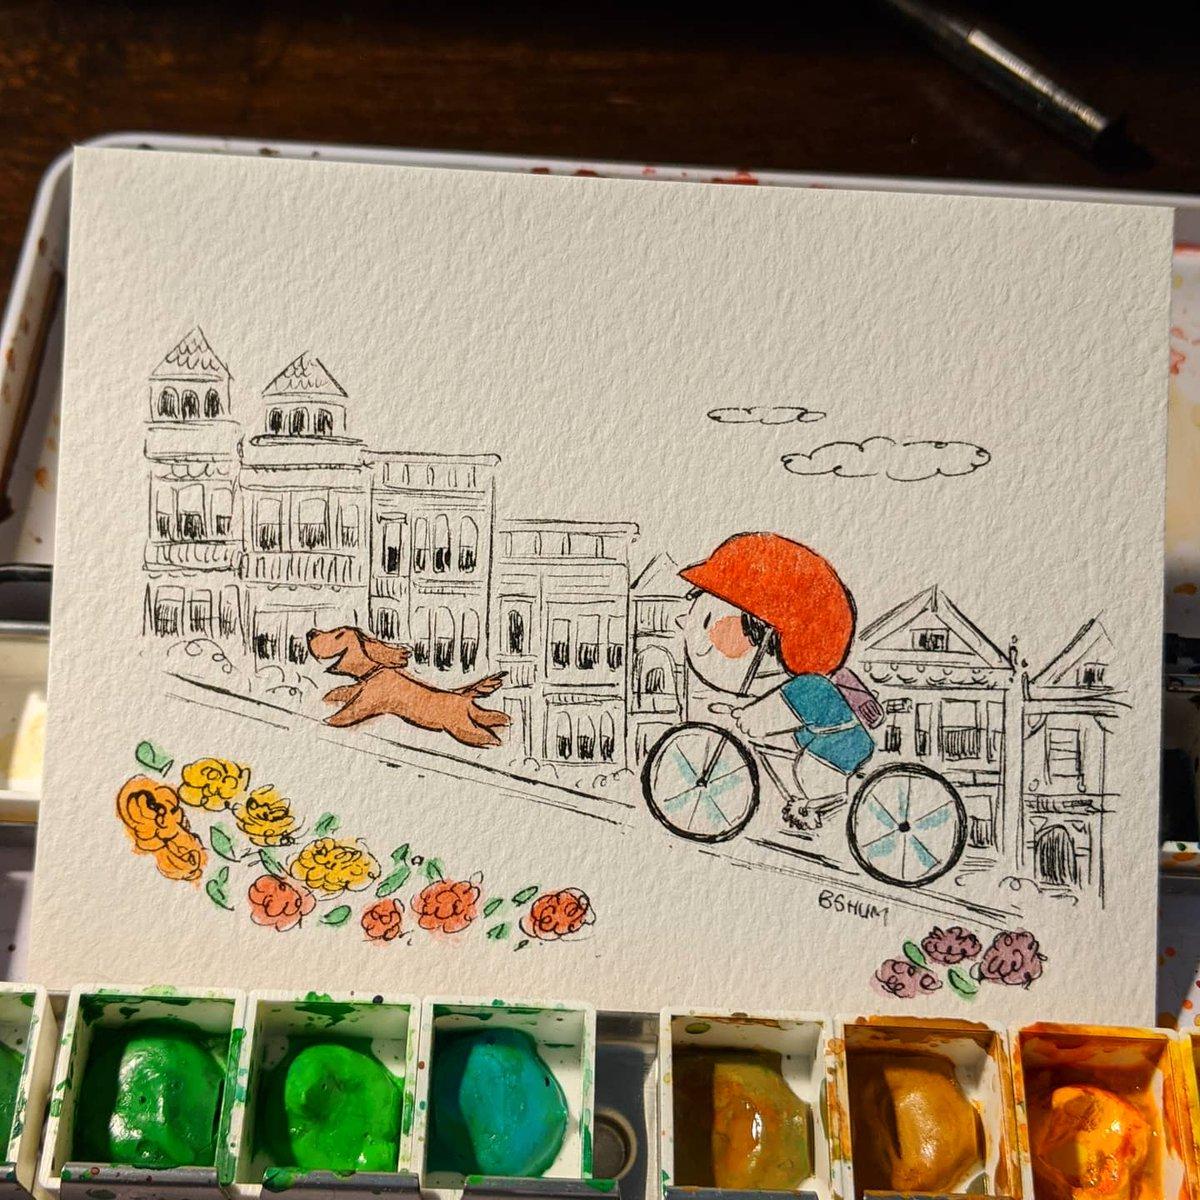 A ride through San Francisco. #kidlitart #illustrator #SanFrancisco #cycling #exercise #dogspic.twitter.com/VGAcP3c6mj